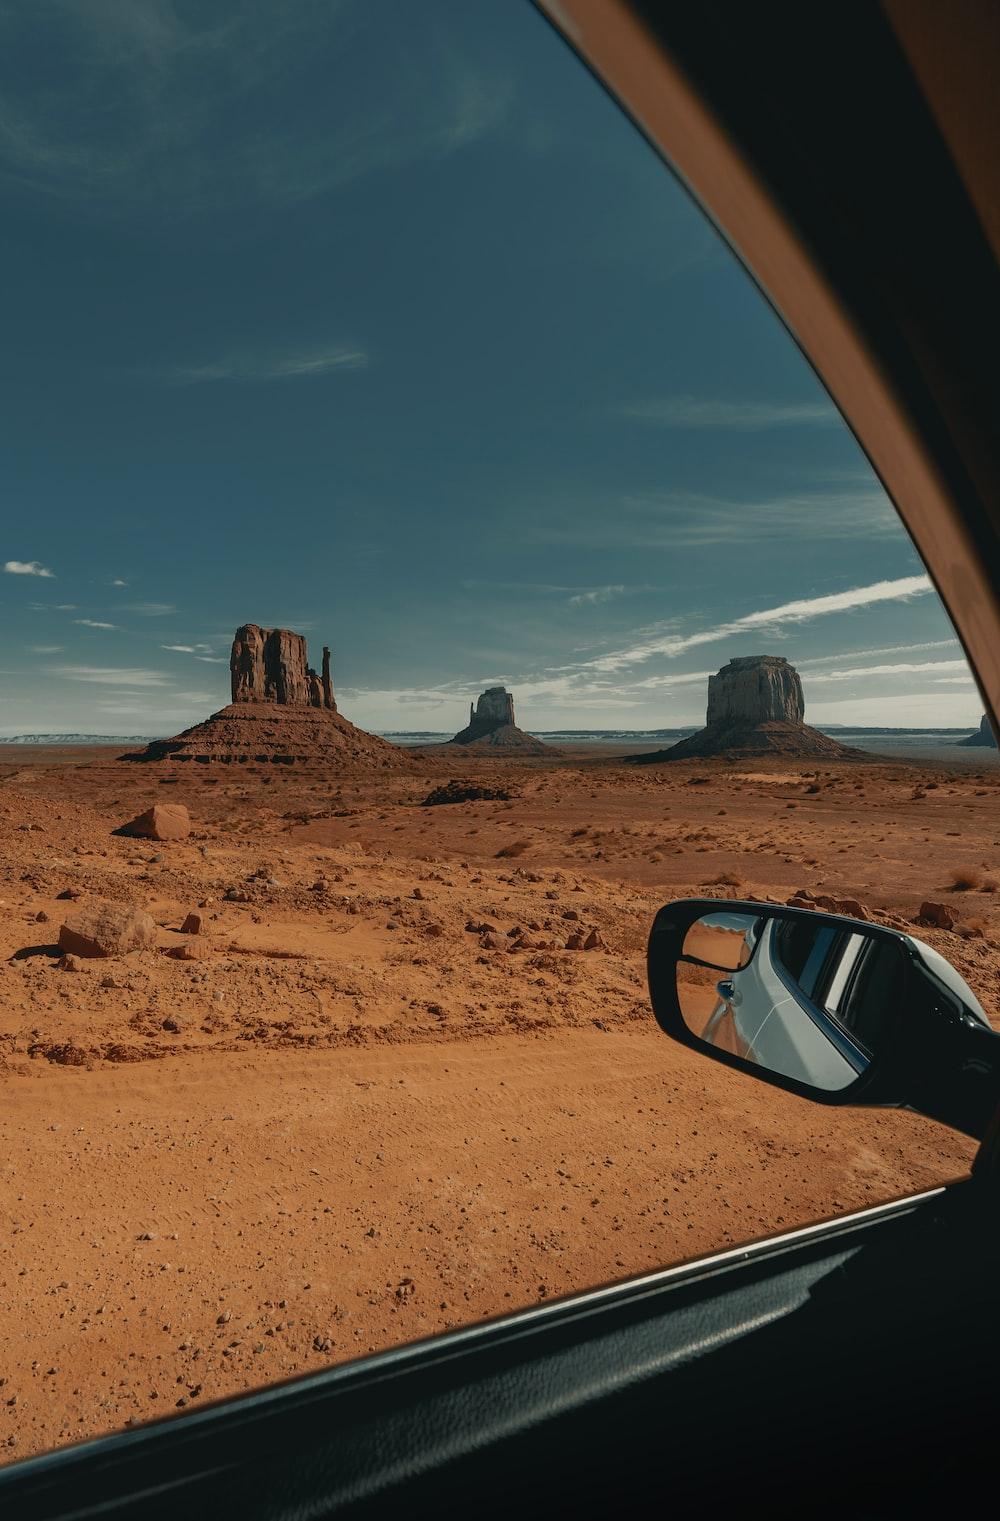 brown car on brown sand under blue sky during daytime